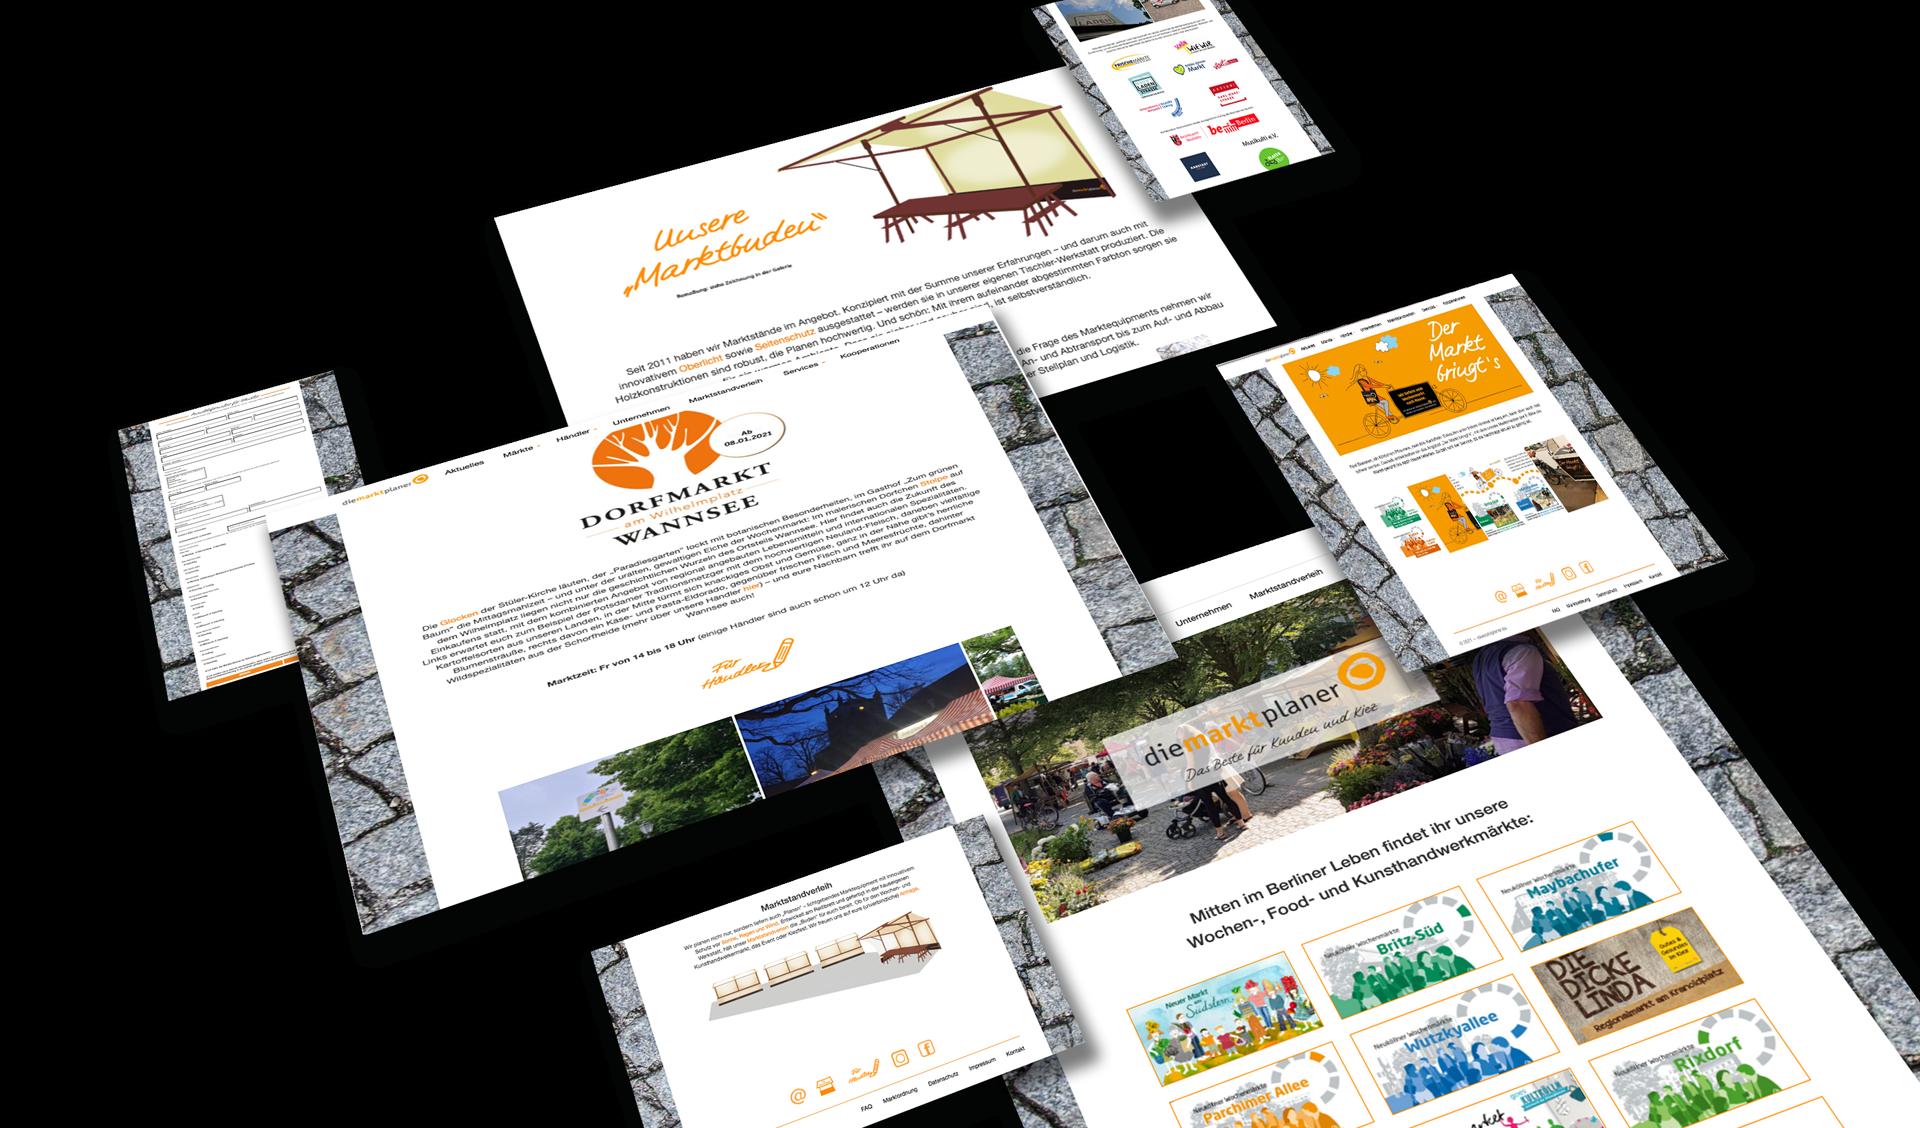 Website Wochenmärkte